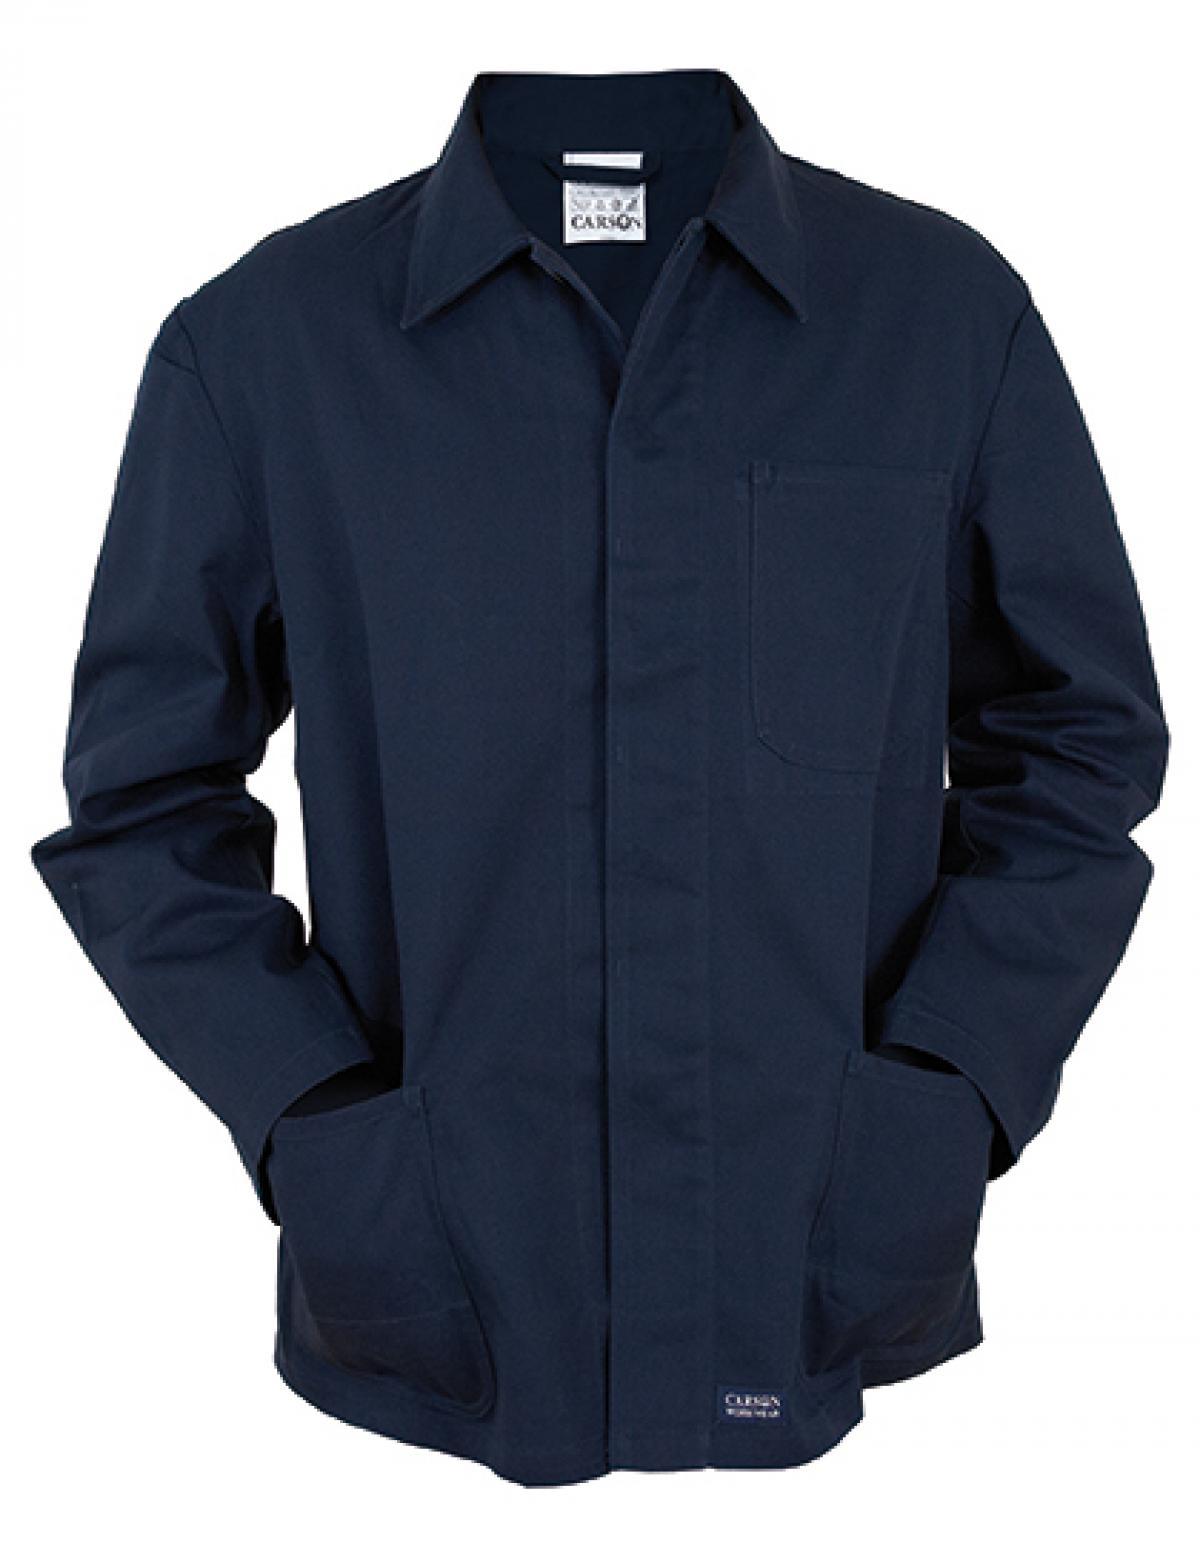 herren classic long work jacket bis 60 grad waschbar. Black Bedroom Furniture Sets. Home Design Ideas